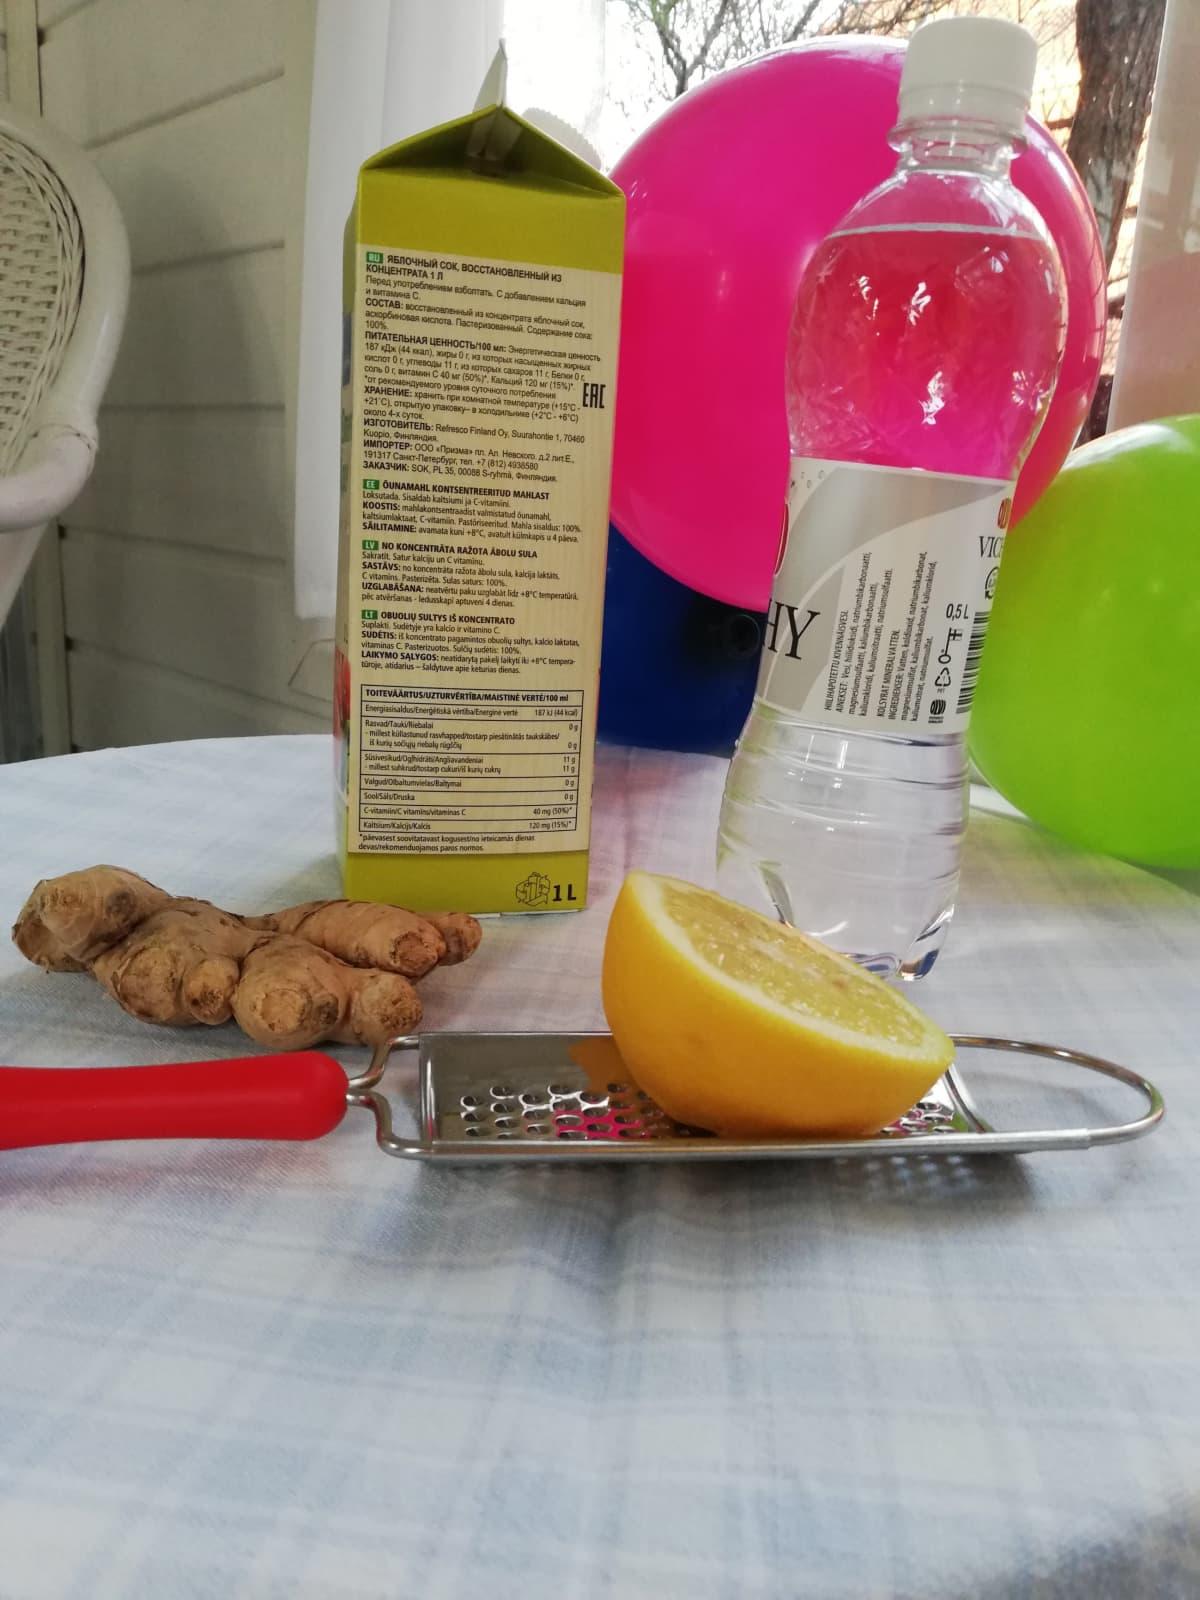 Pikasiman ainekset:omenamehu, kivennäisvesi, sitruuna ja inkivääri pöydällä.